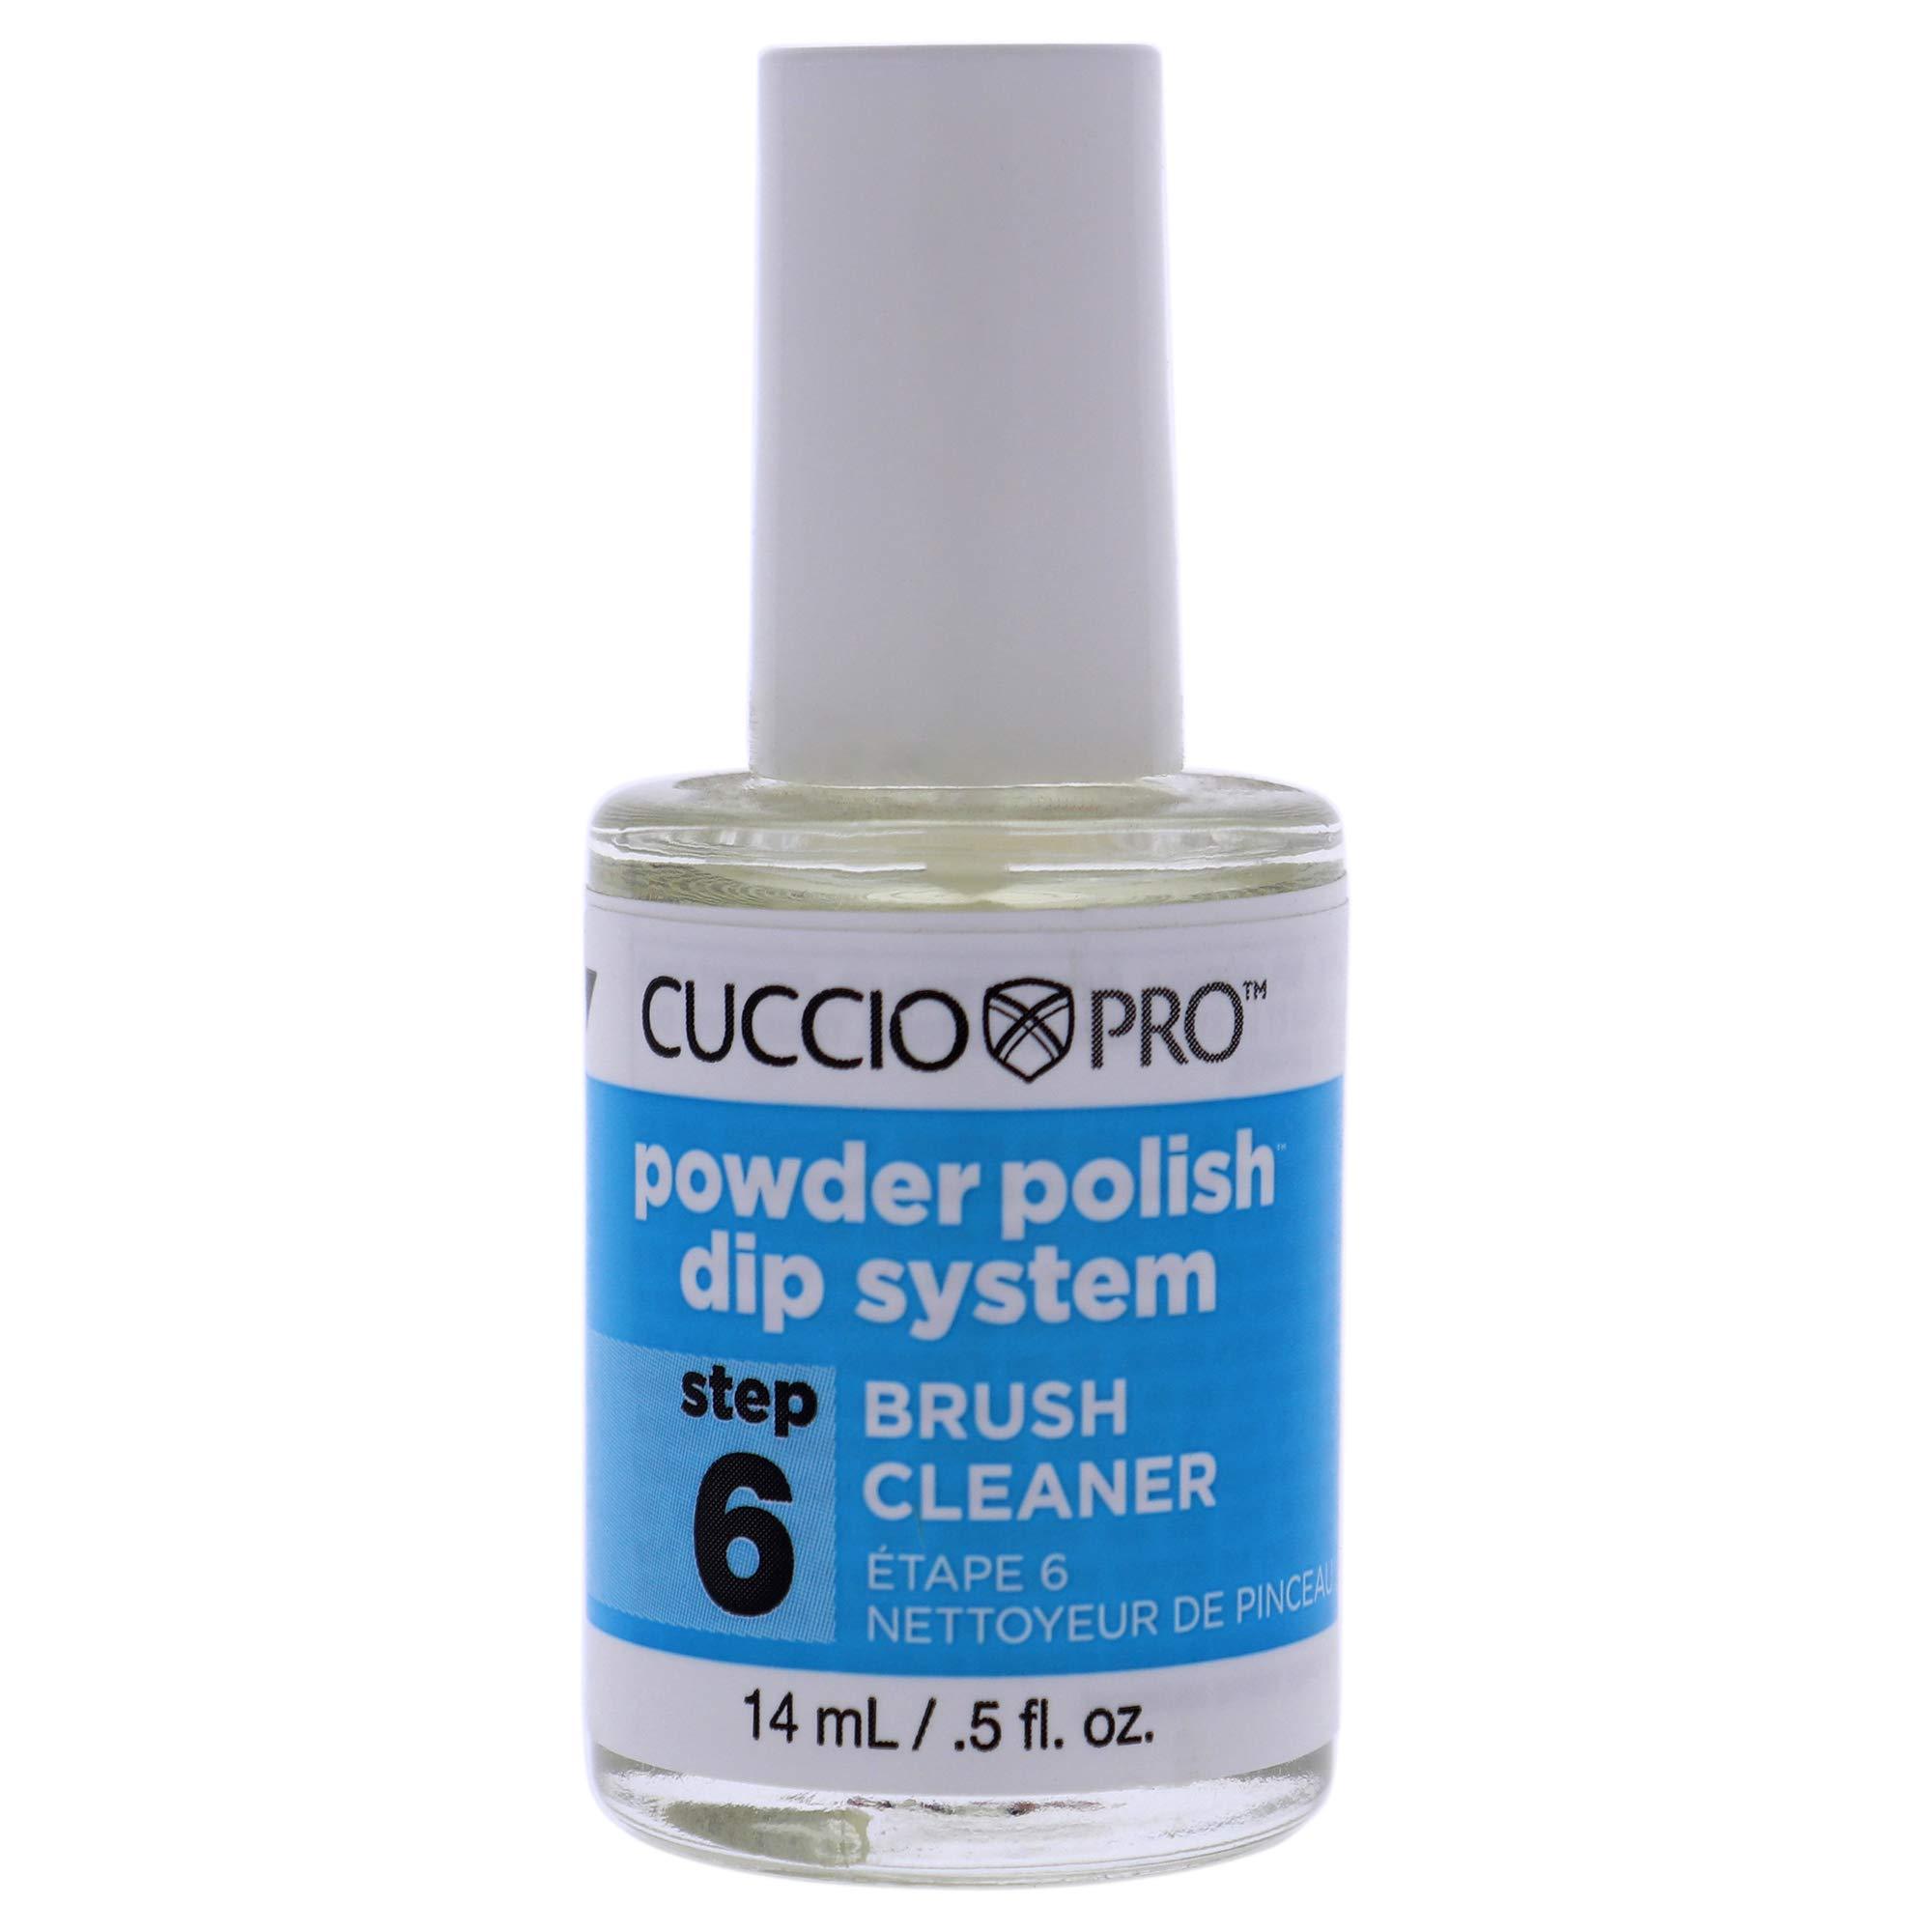 Cuccio Naturale Cuccio Pro Powder Polish Dip System Brush Cleaner - Step 6, 0.5 Oz (I0098681)